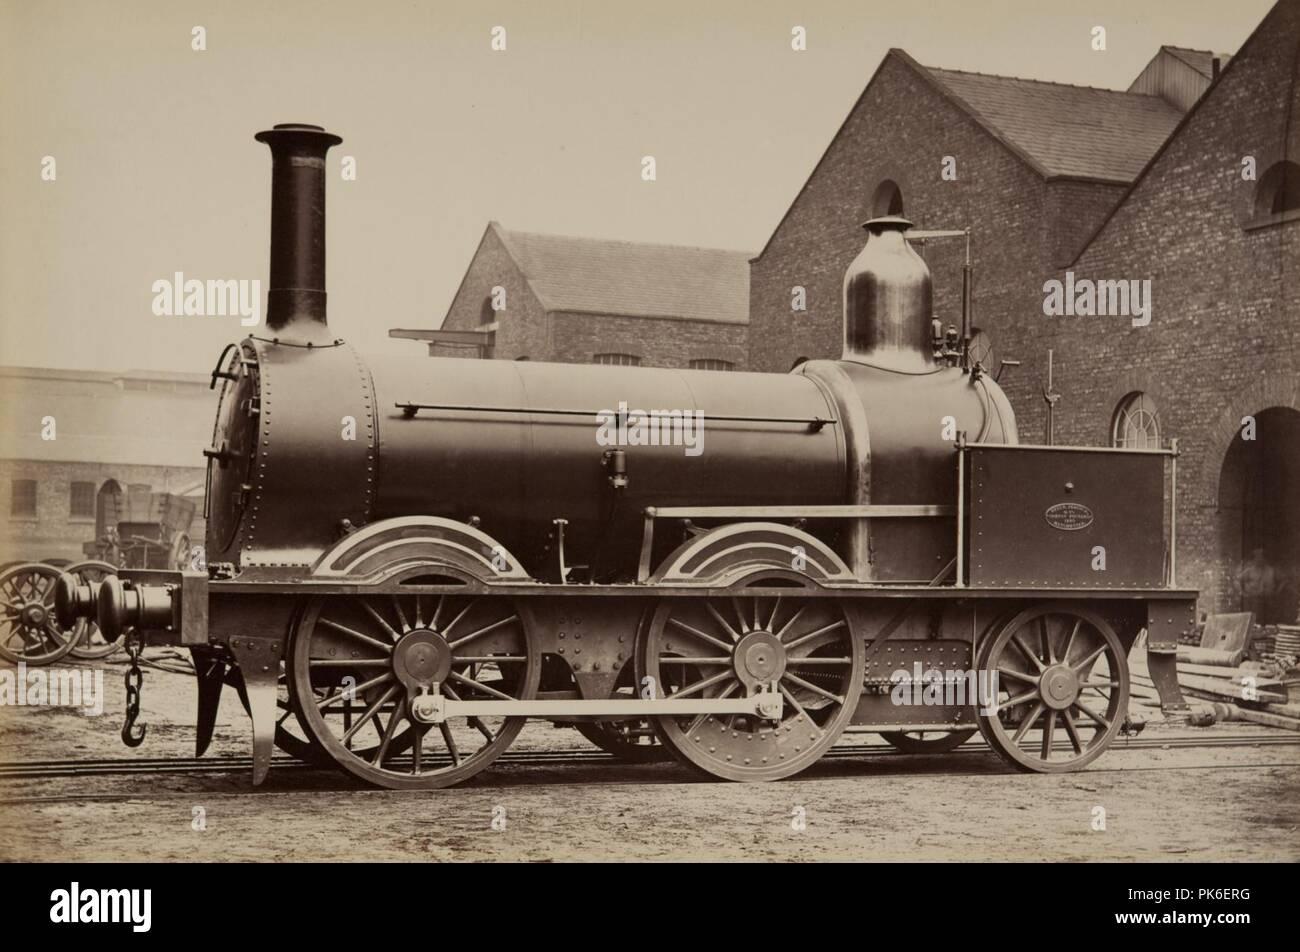 Beyer Peacock - Madras Railway No 425. - Stock Image